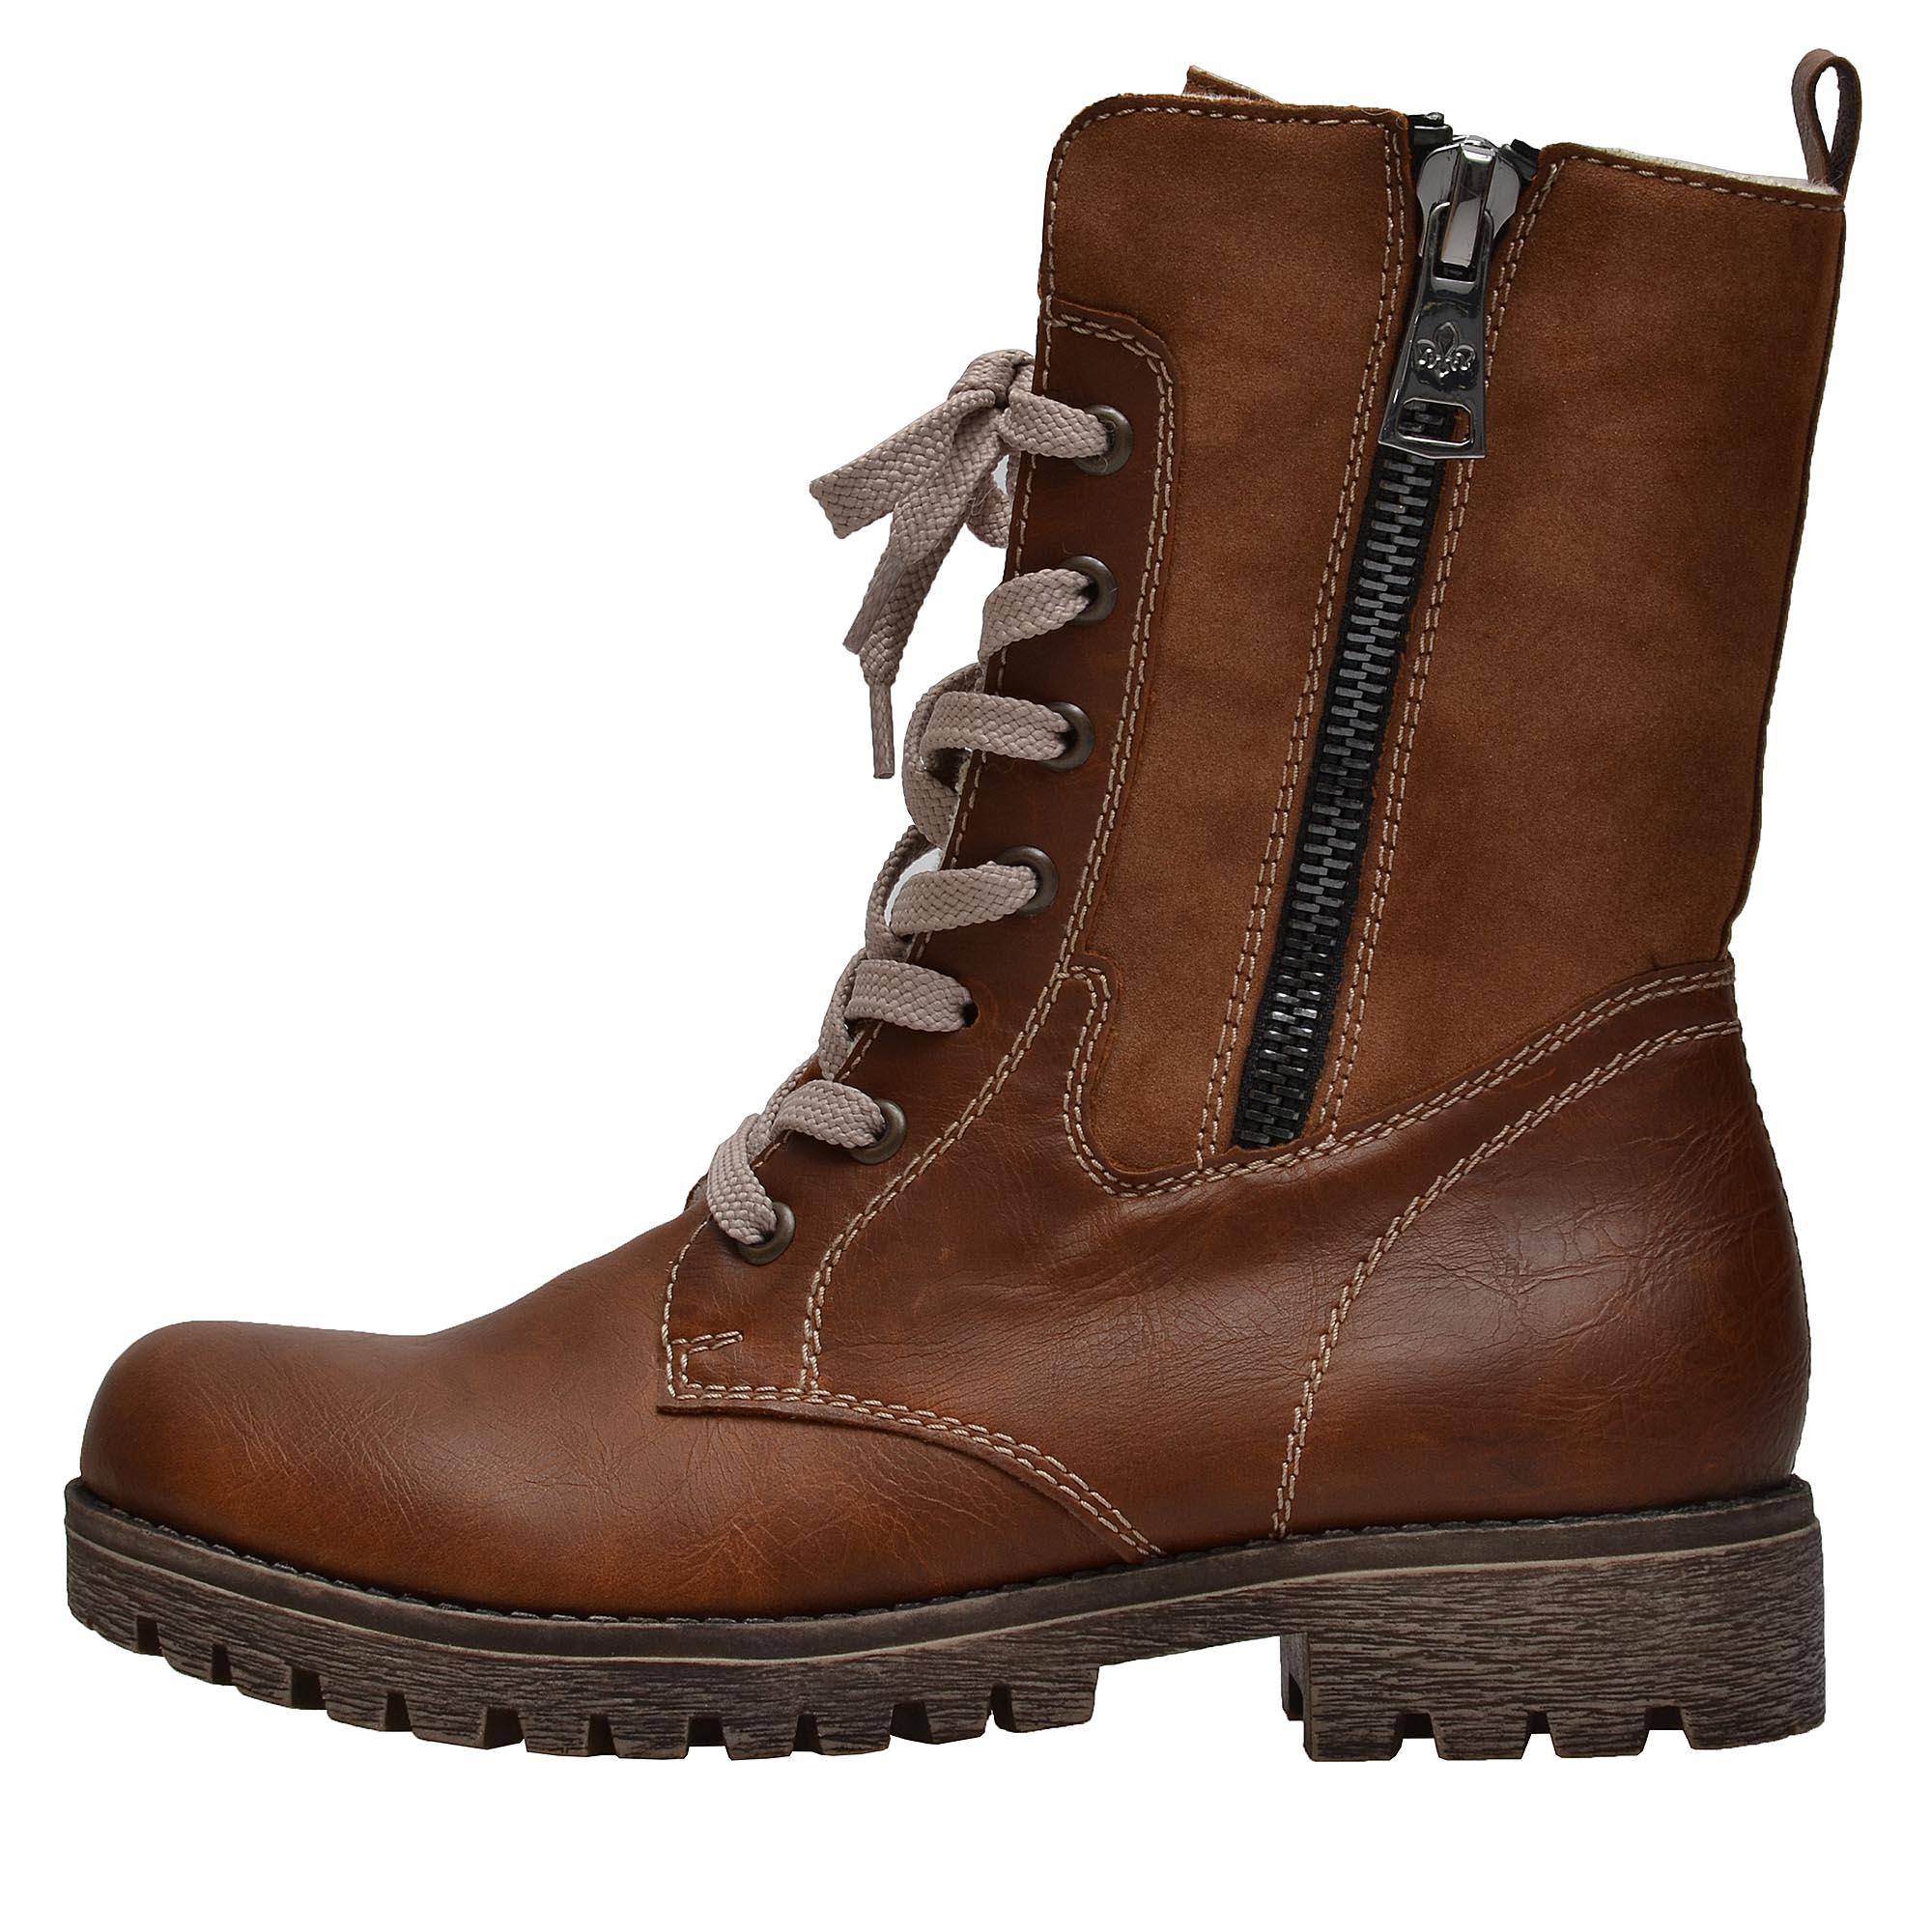 76d13b379 Dámska obuv RIEKER 785K1/25 BRAUN KOMBI H/W 8 | Rieker